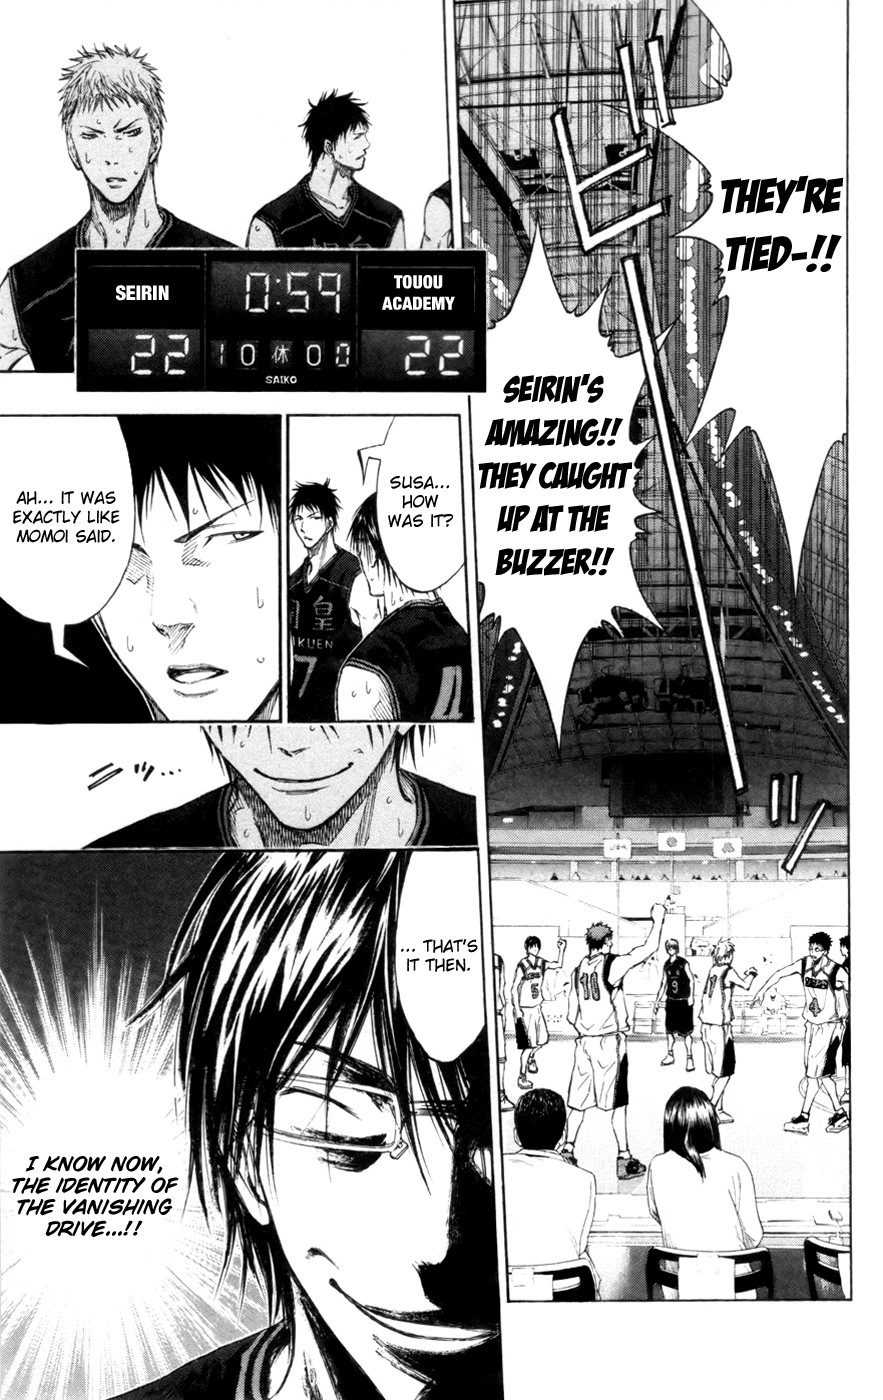 Kuroko no Basket Manga Chapter 118 - Image 4_025